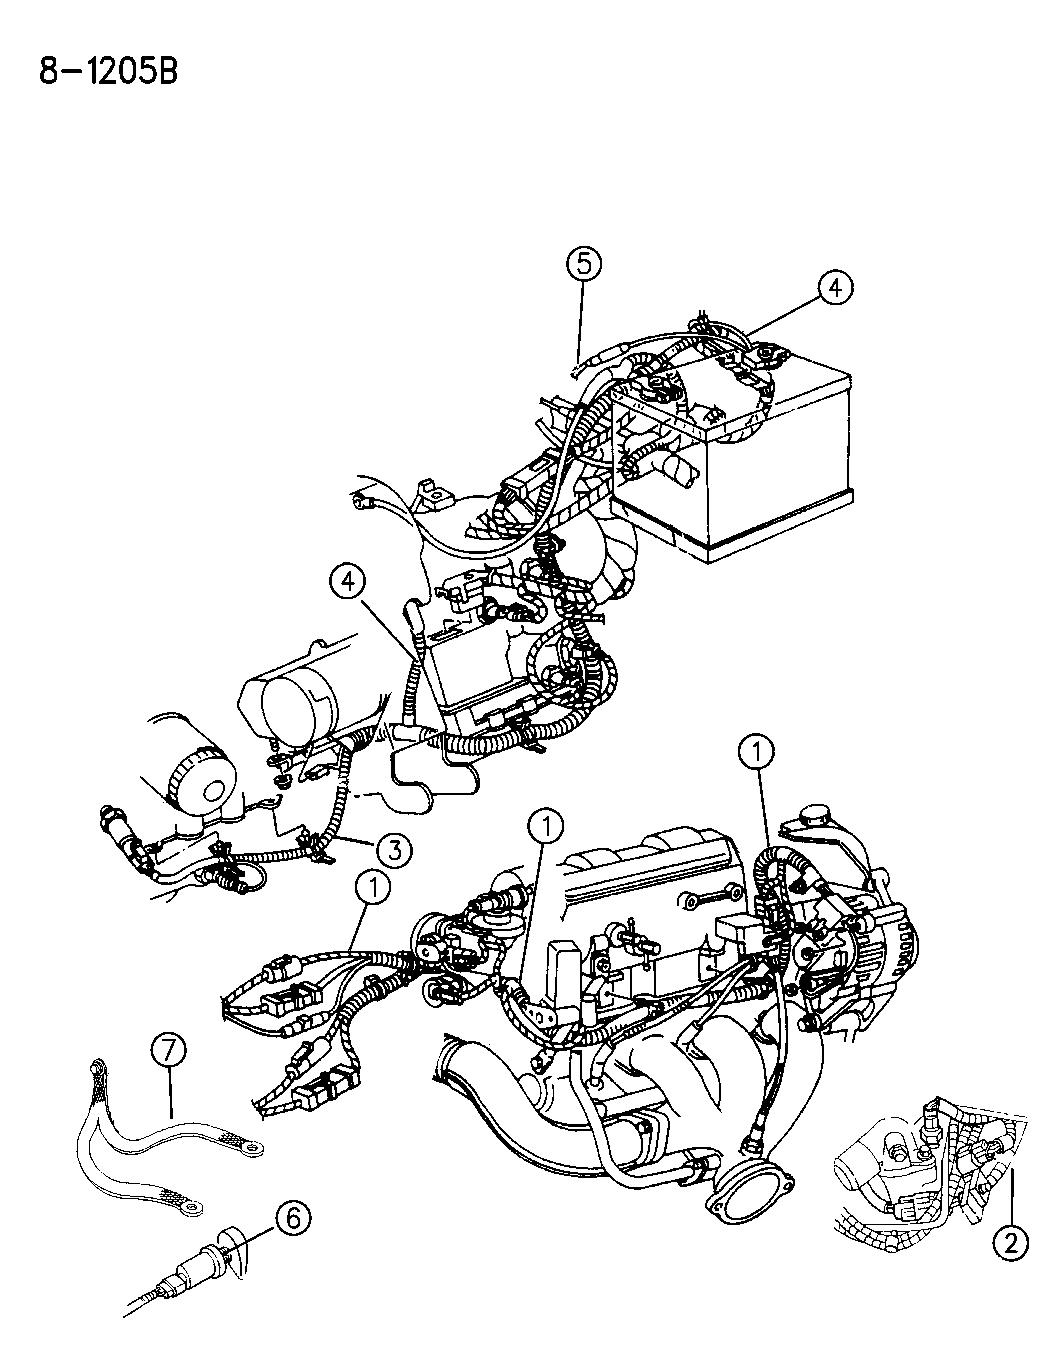 mopar 4692012 1993 Chrysler Concorde Steering Wheel Factory